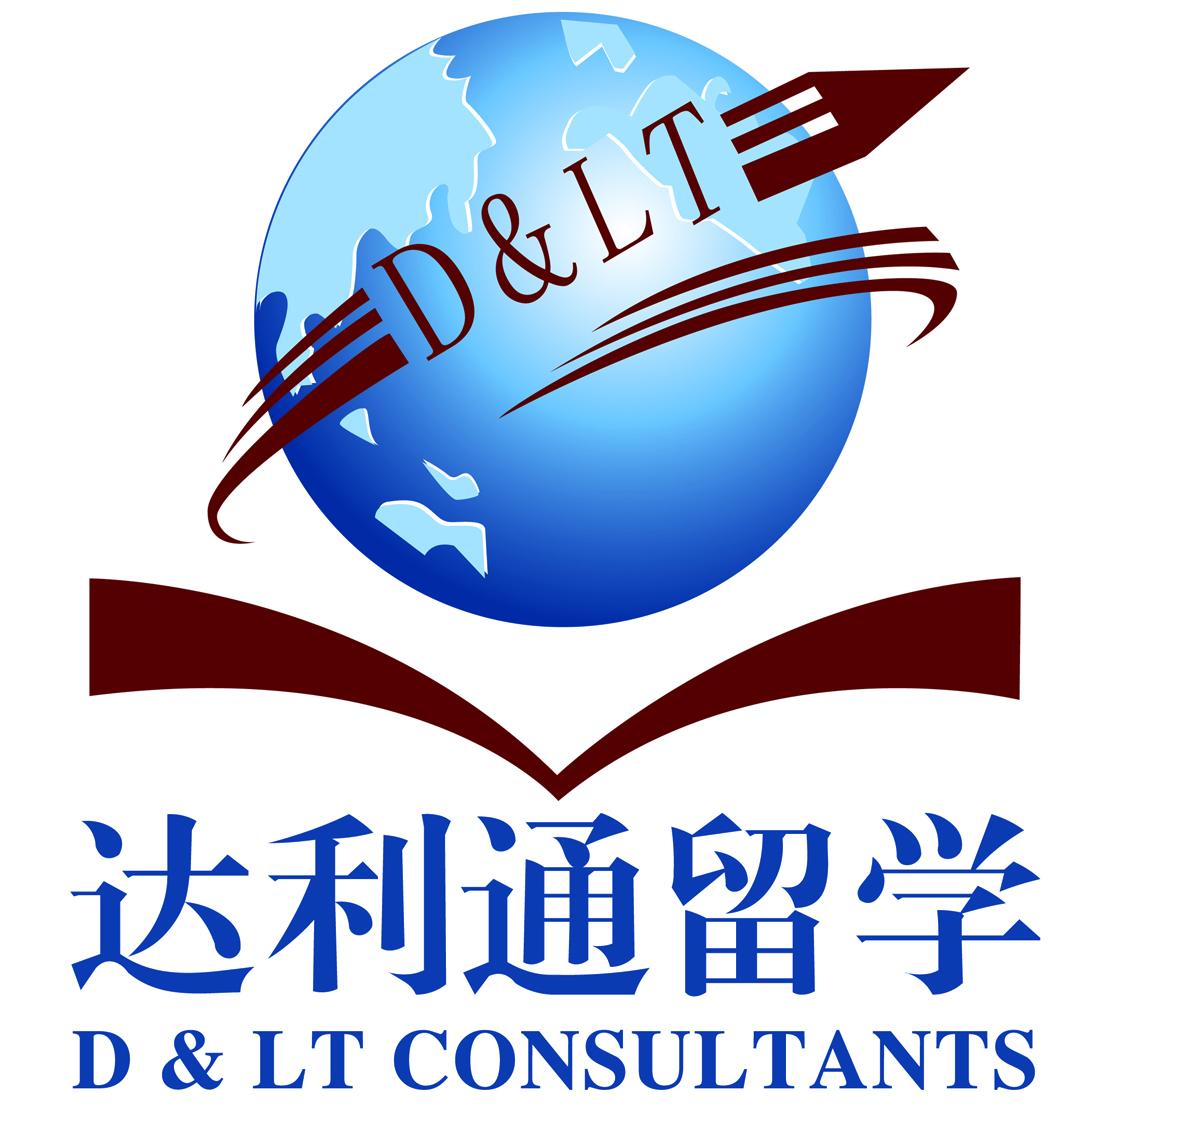 Logo Agents D & LT Consultants Co., Ltd.jpg